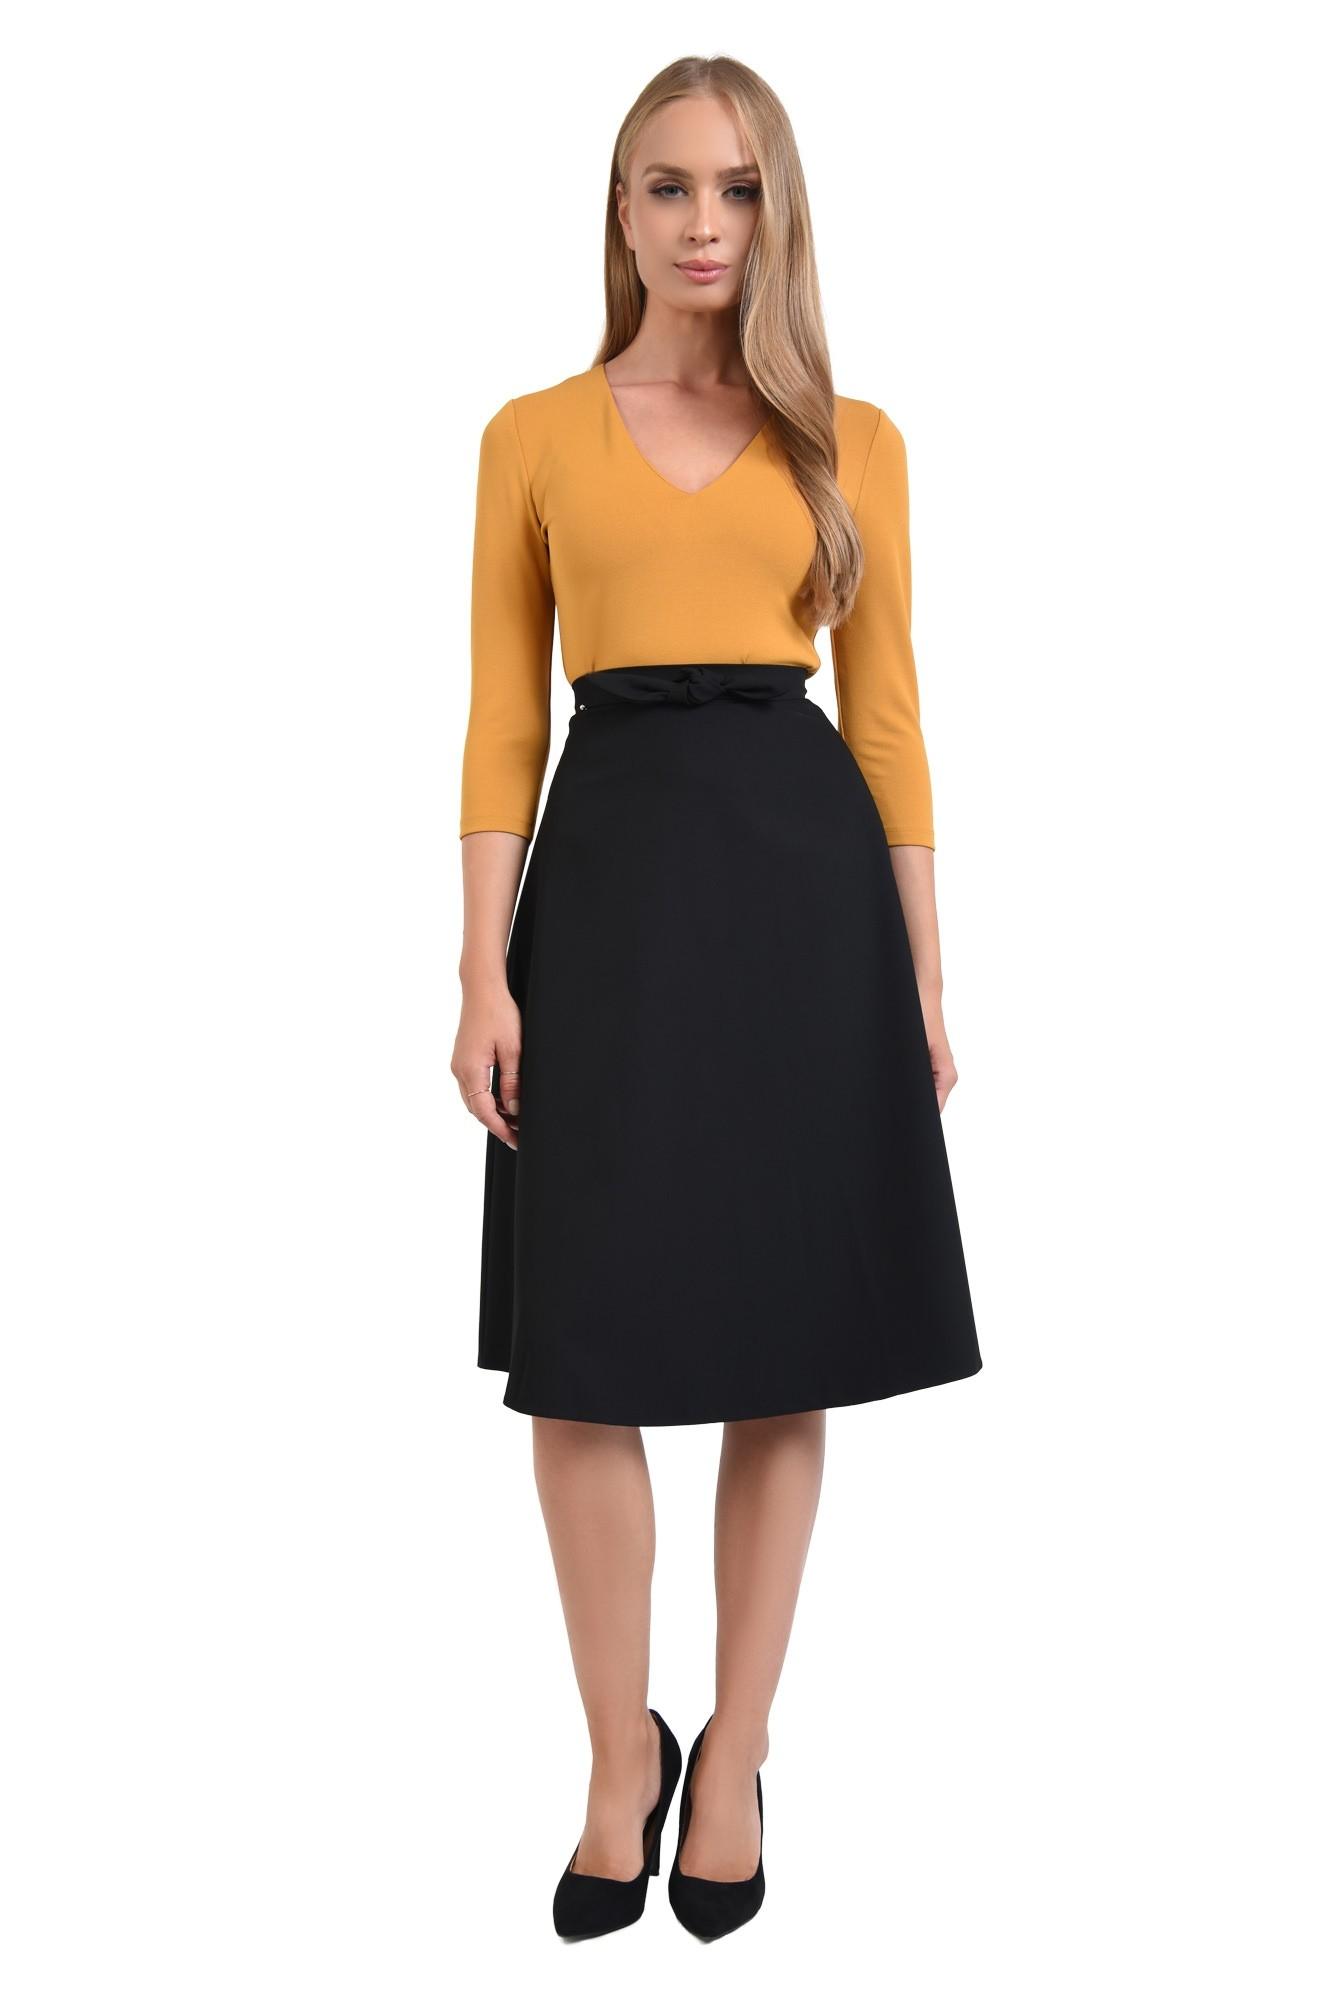 360 - bluza casual mustar, decoltata, croi drept, anchior, tesatura elastica